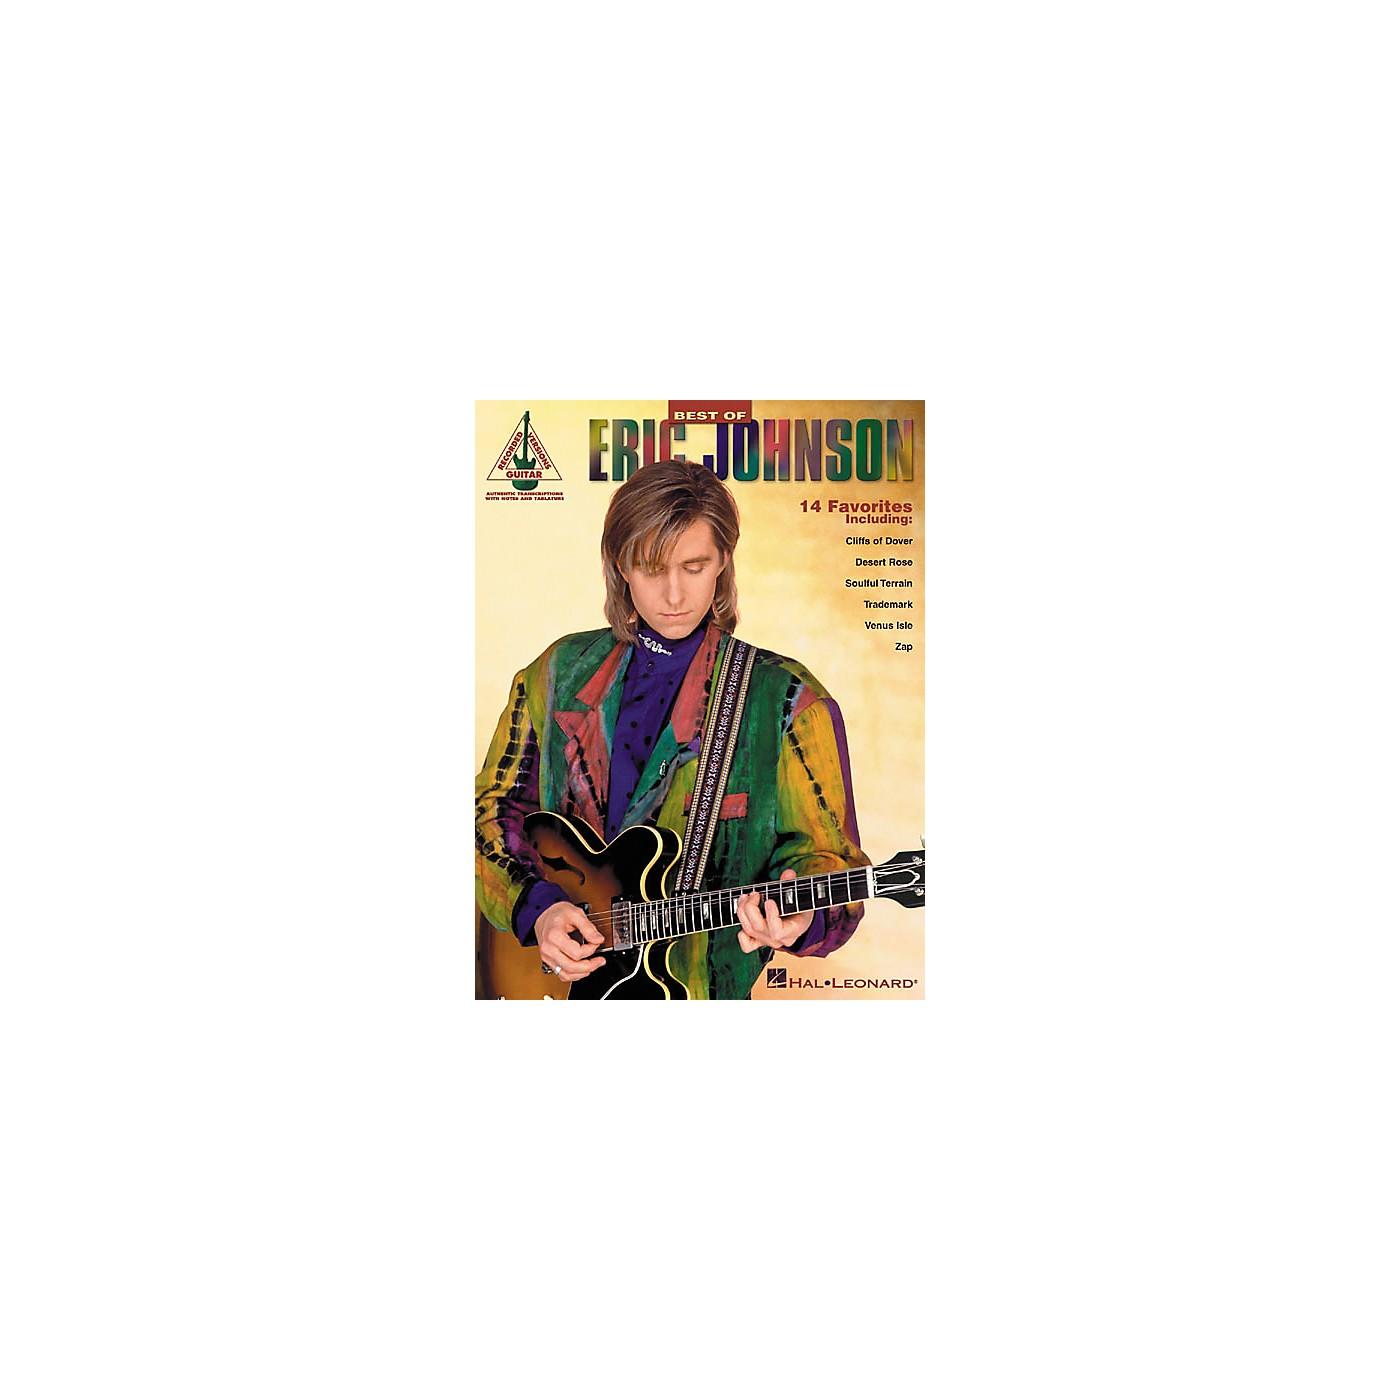 Hal Leonard Best of Eric Johnson Guitar Tab Songbook thumbnail